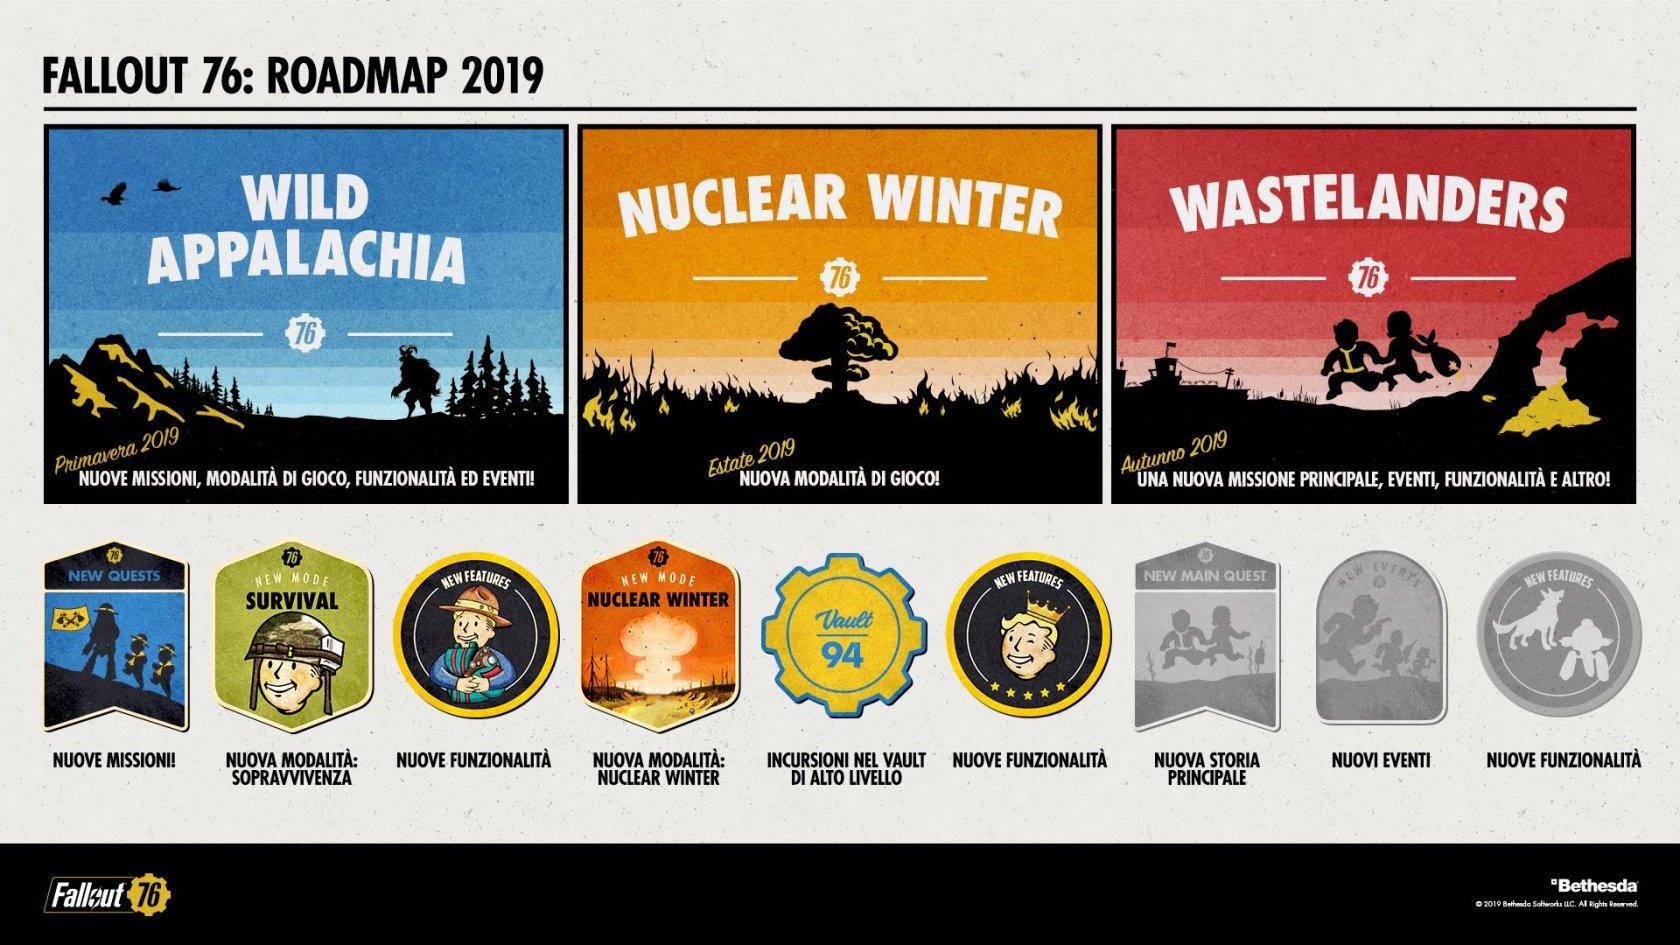 https://ilovevg.it/wp-content/uploads/2019/02/Fallout76_RoadMap_1920x1080_eu_it.jpg